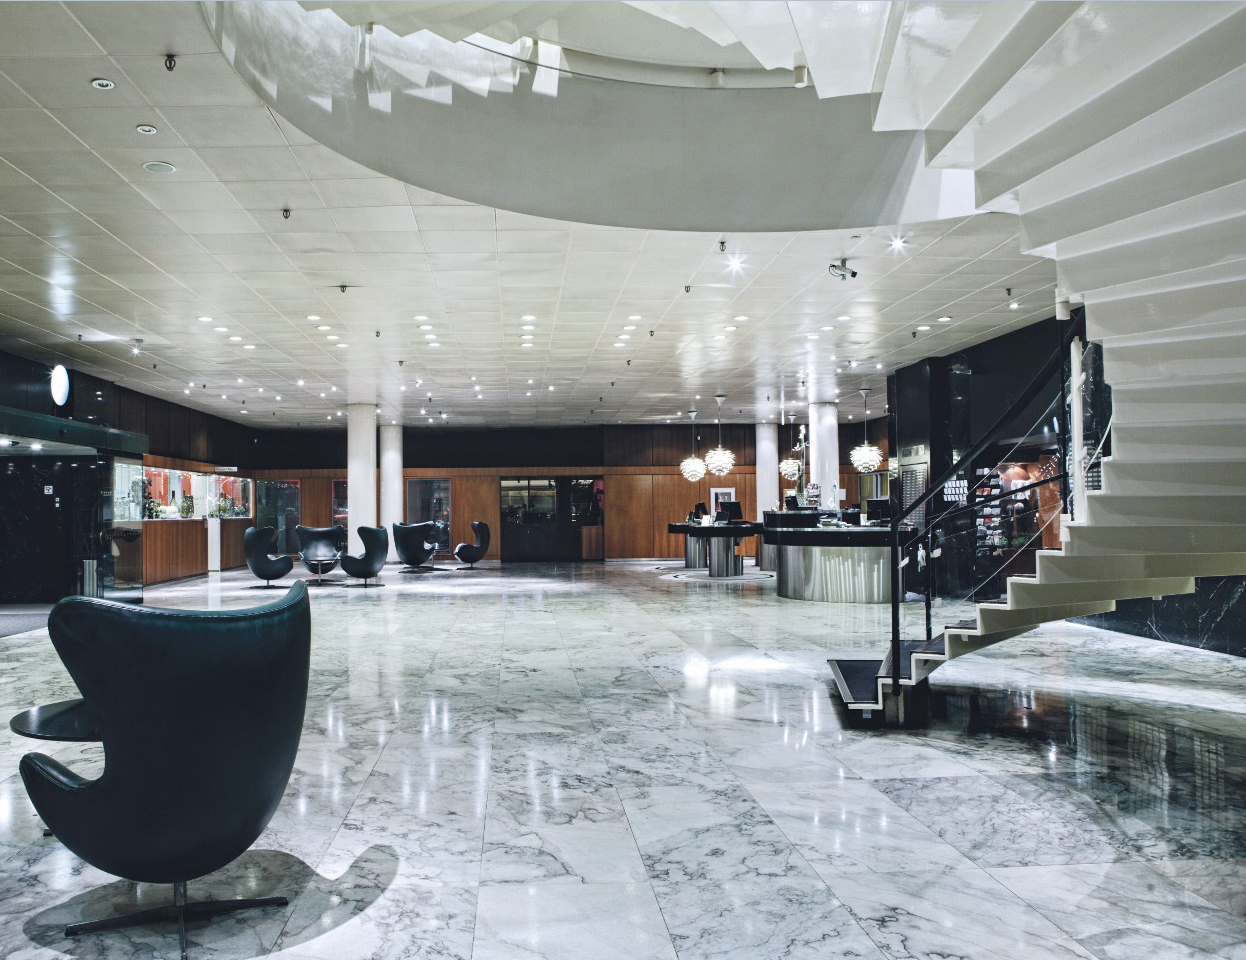 Radisson Blu Royal Hotel Sorensen Leather